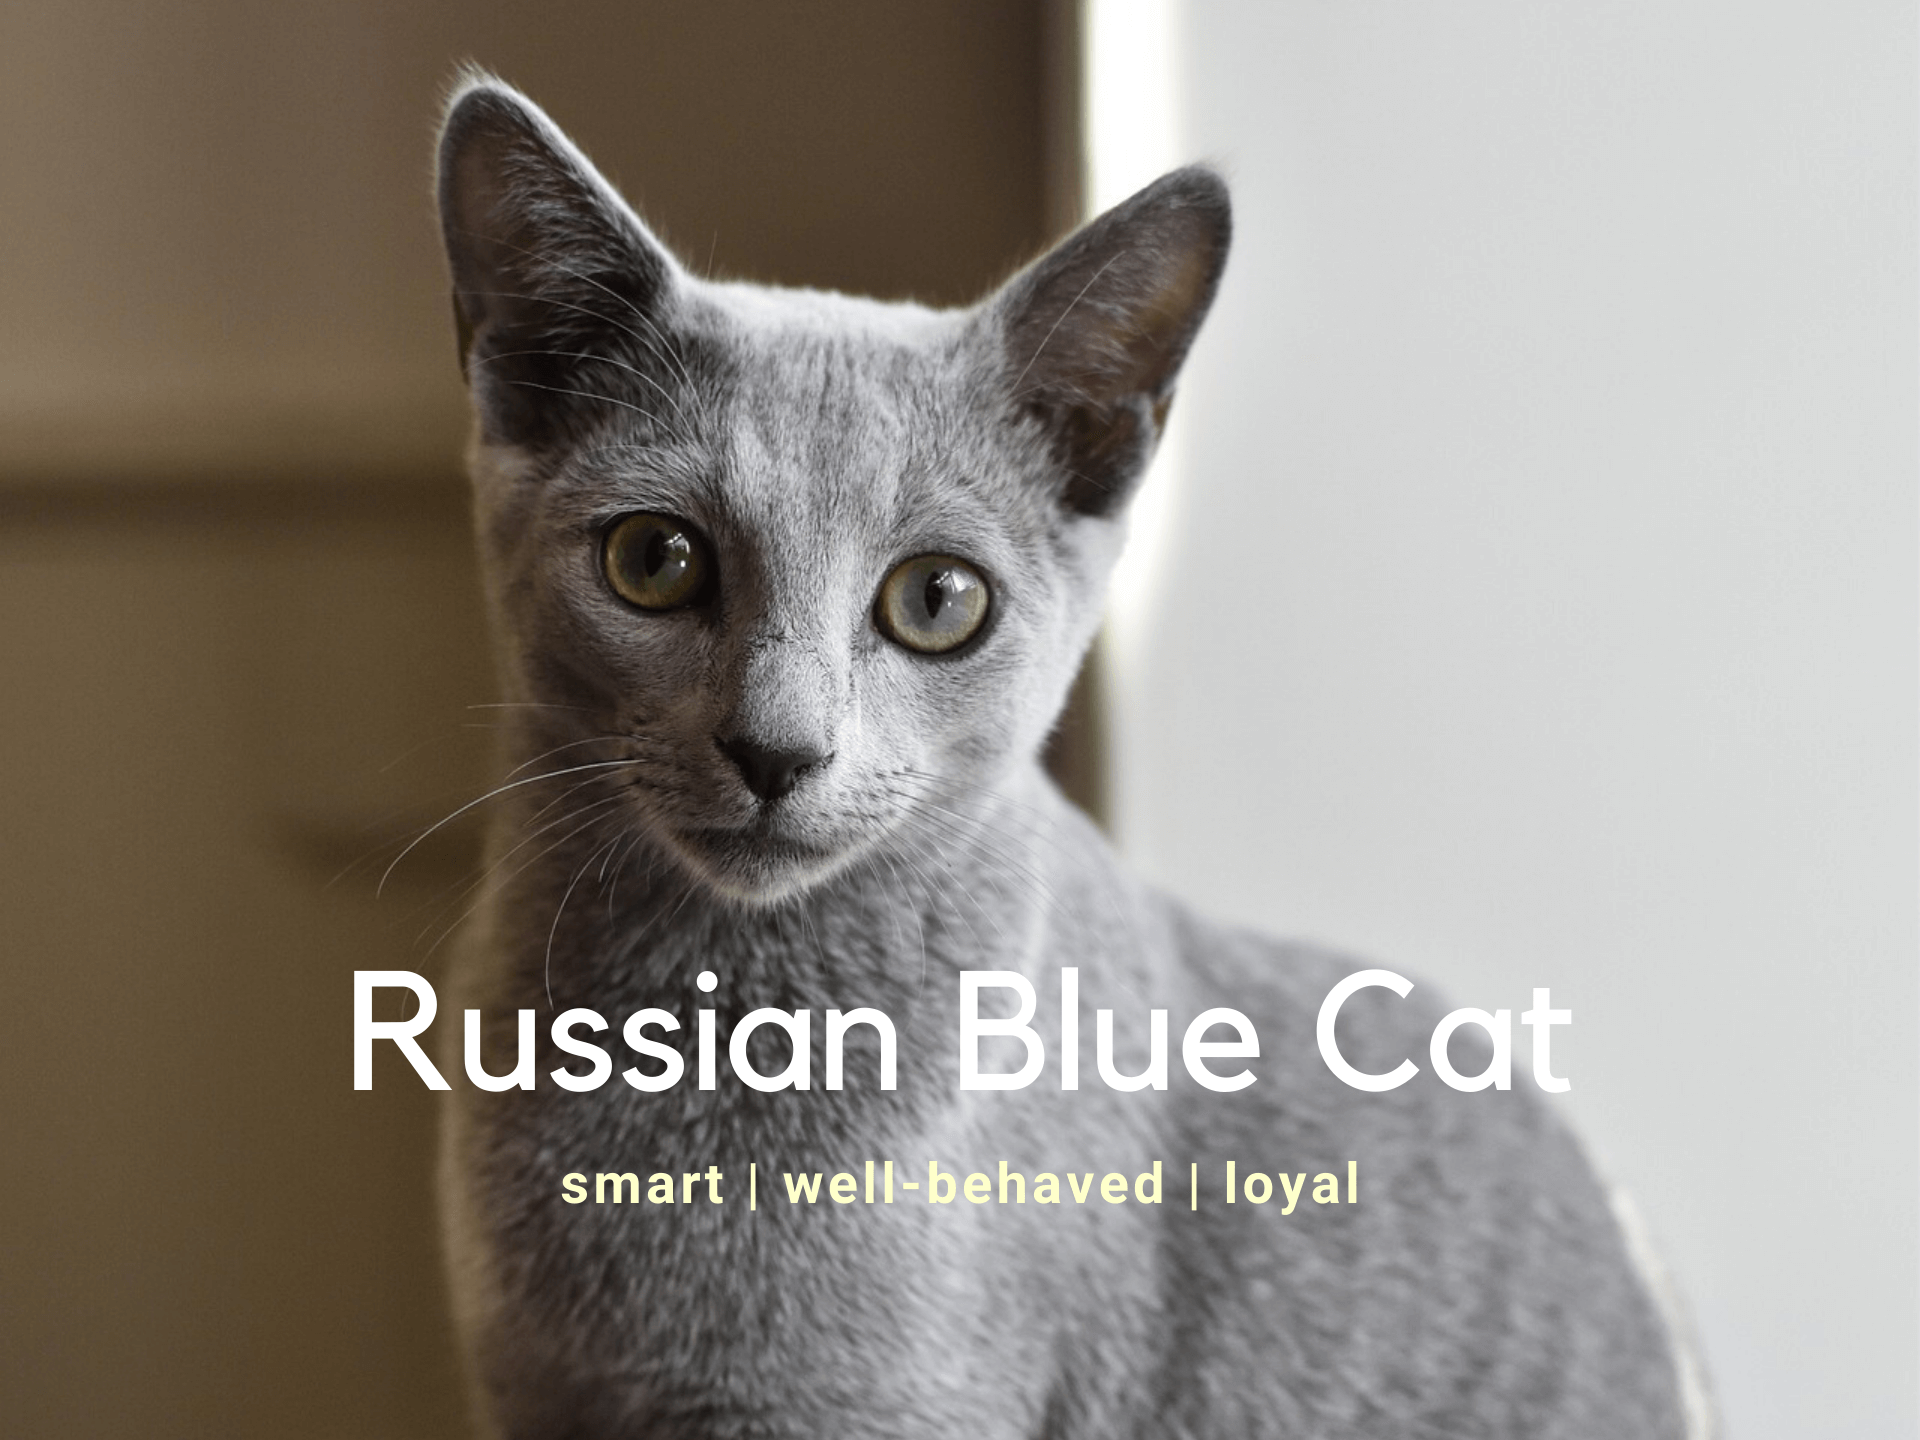 Russian Blue Cat - Breed Information